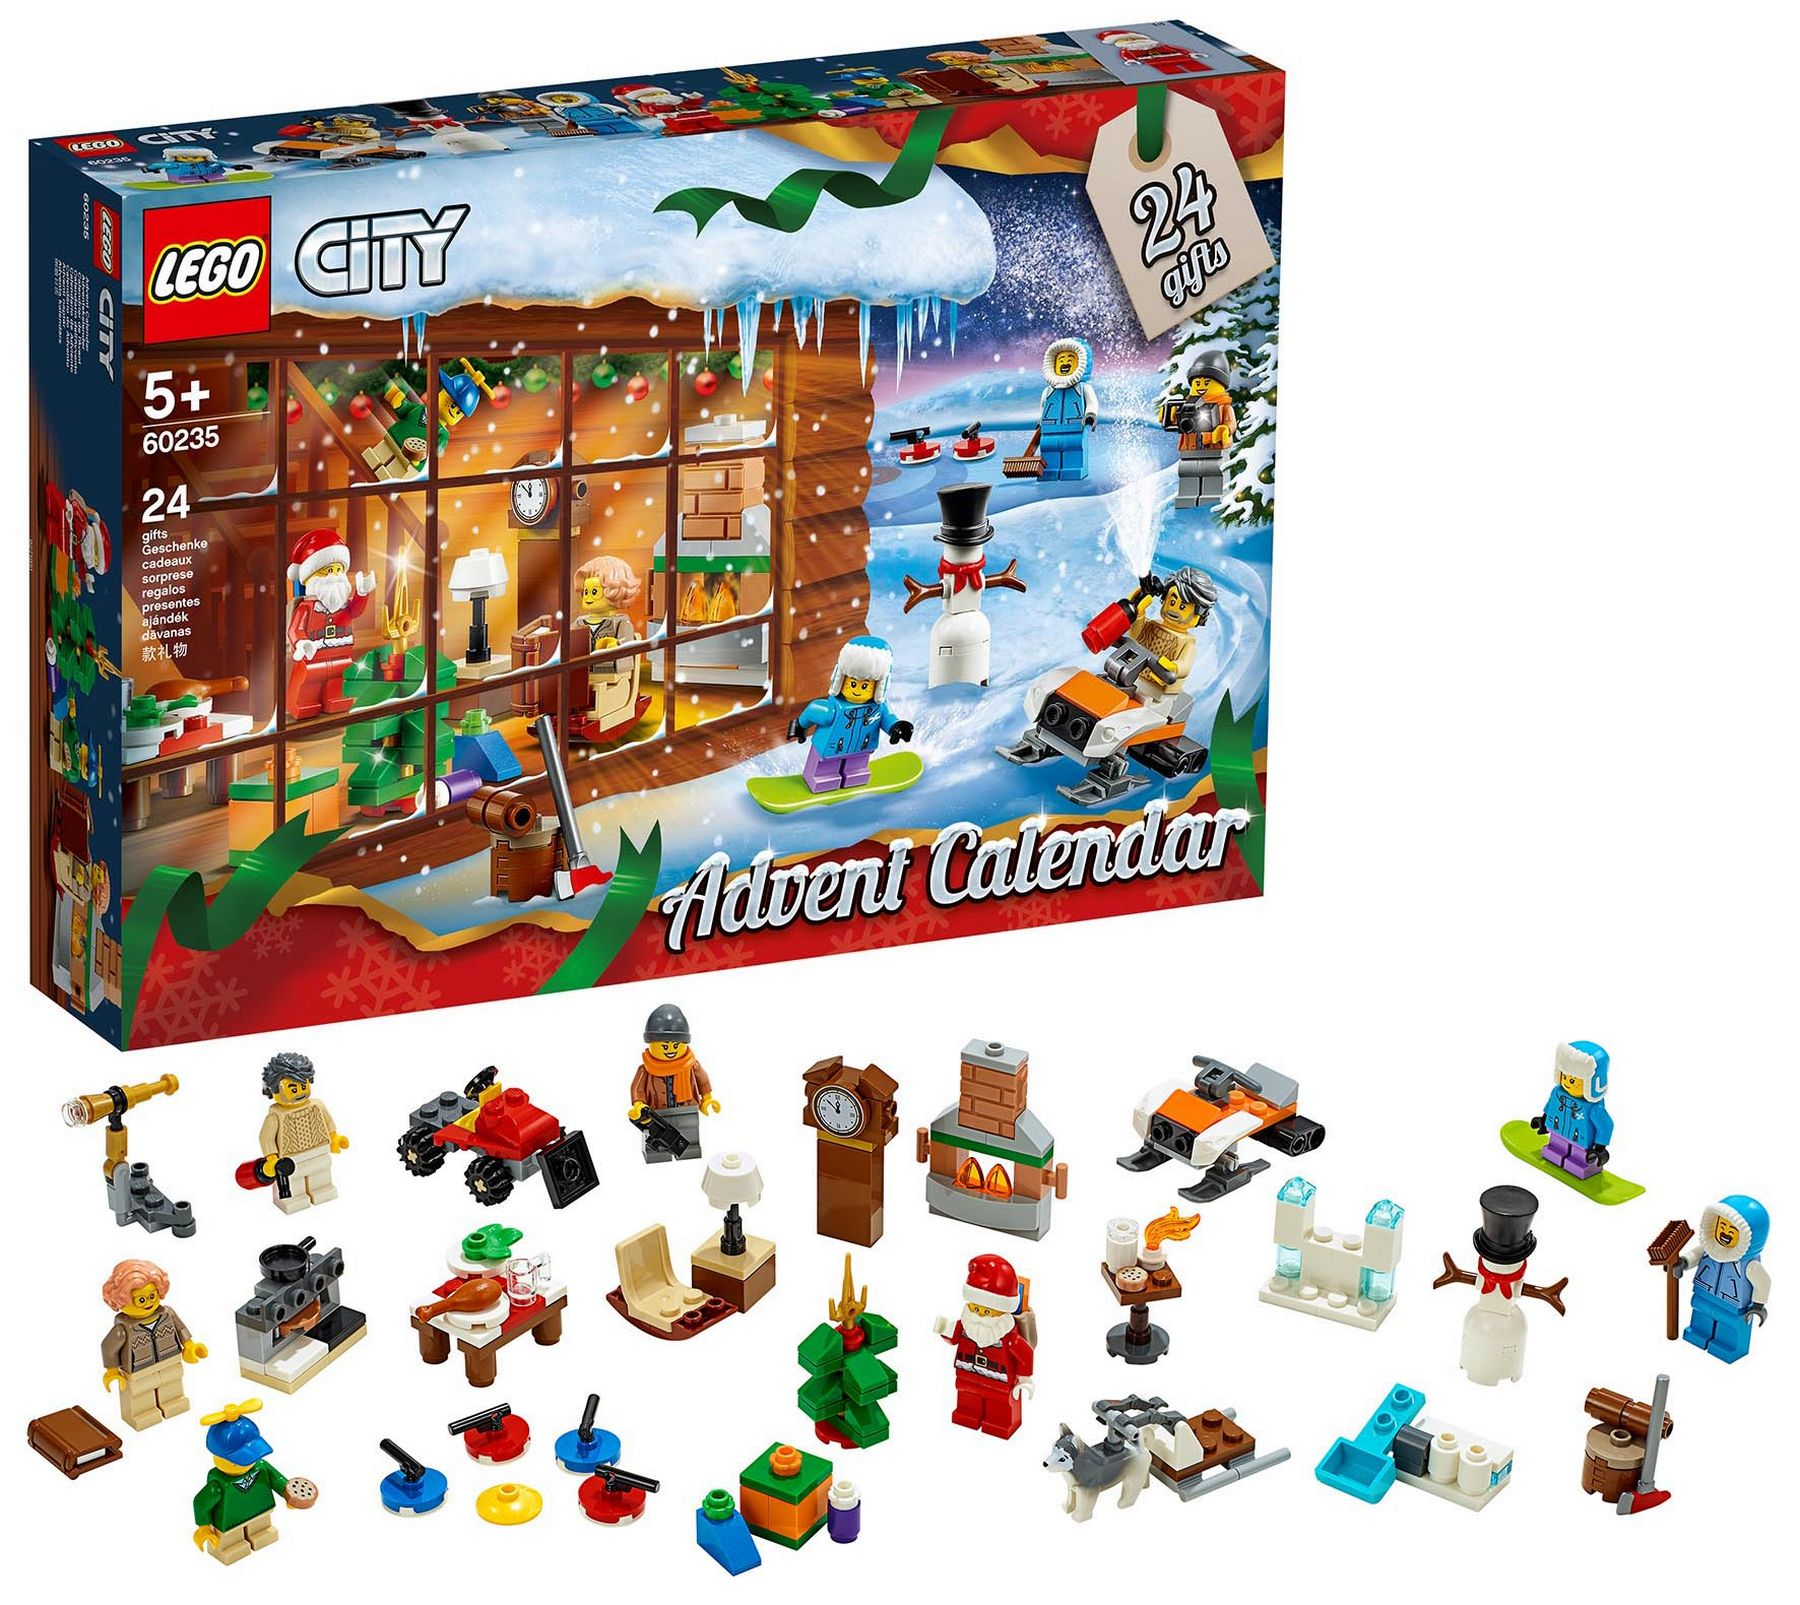 CALENDARIO AVVENTO LEGO CITY